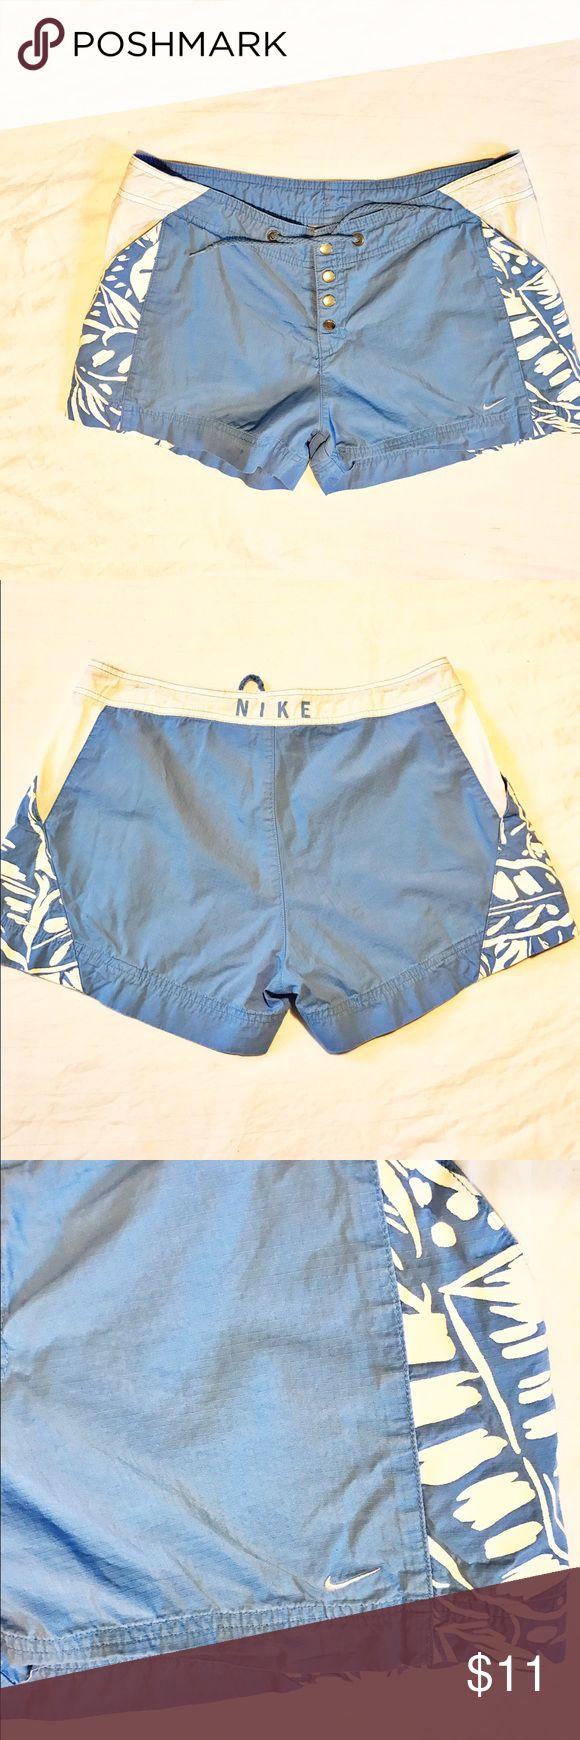 Euc! Nike swim shorts. Size small 4/6 Euc! Nike swim shorts. Size small 4/6. Blue and white with pockets. 4 snap closure with tie waist. Nike Swim